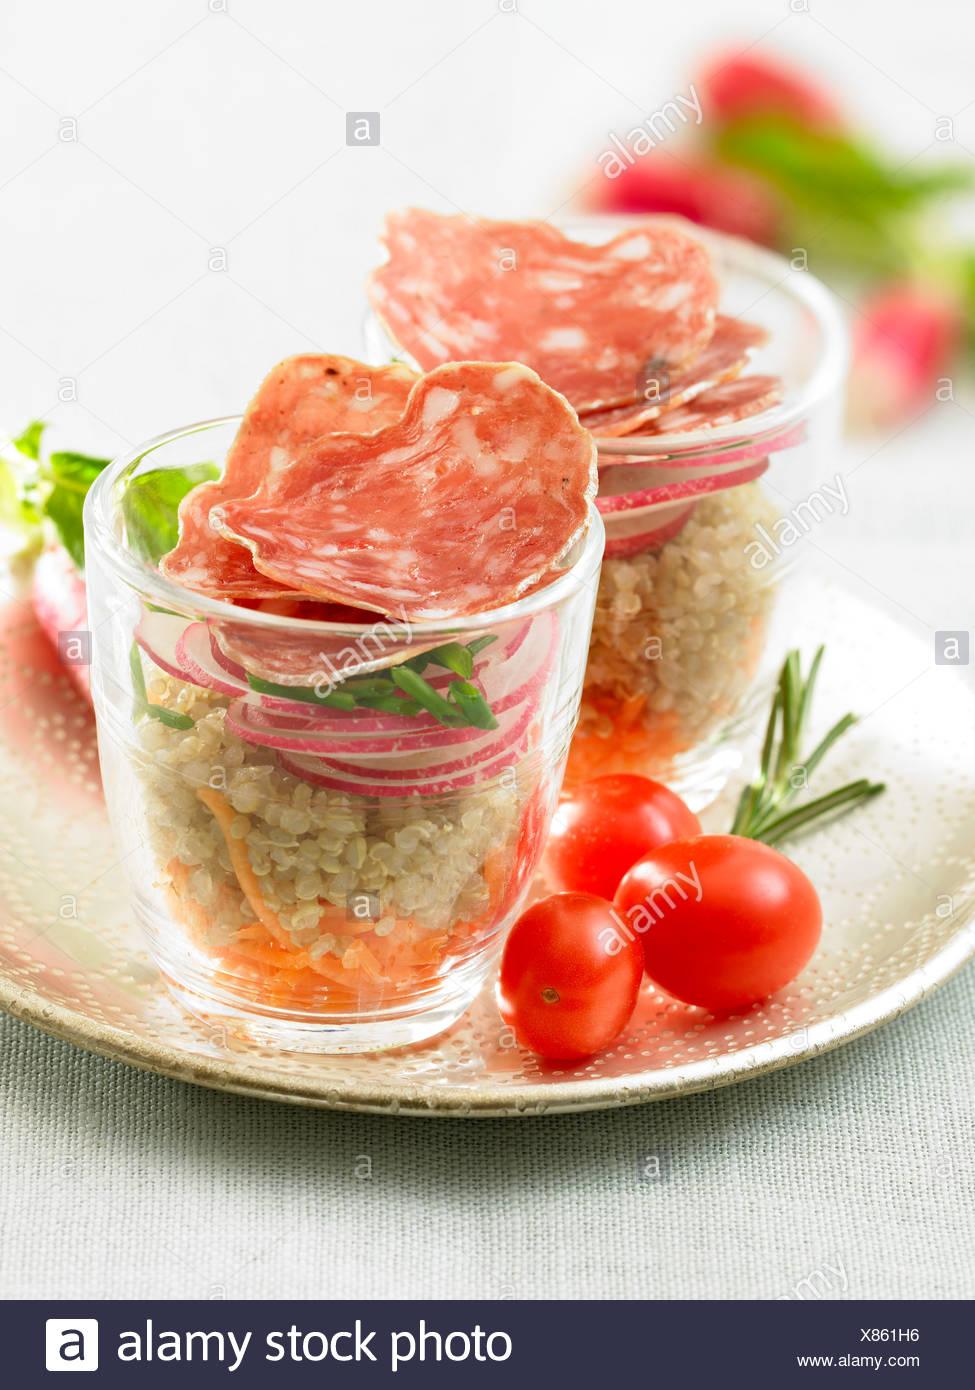 Quinoa,radish,carrot and dried sausage verrine - Stock Image